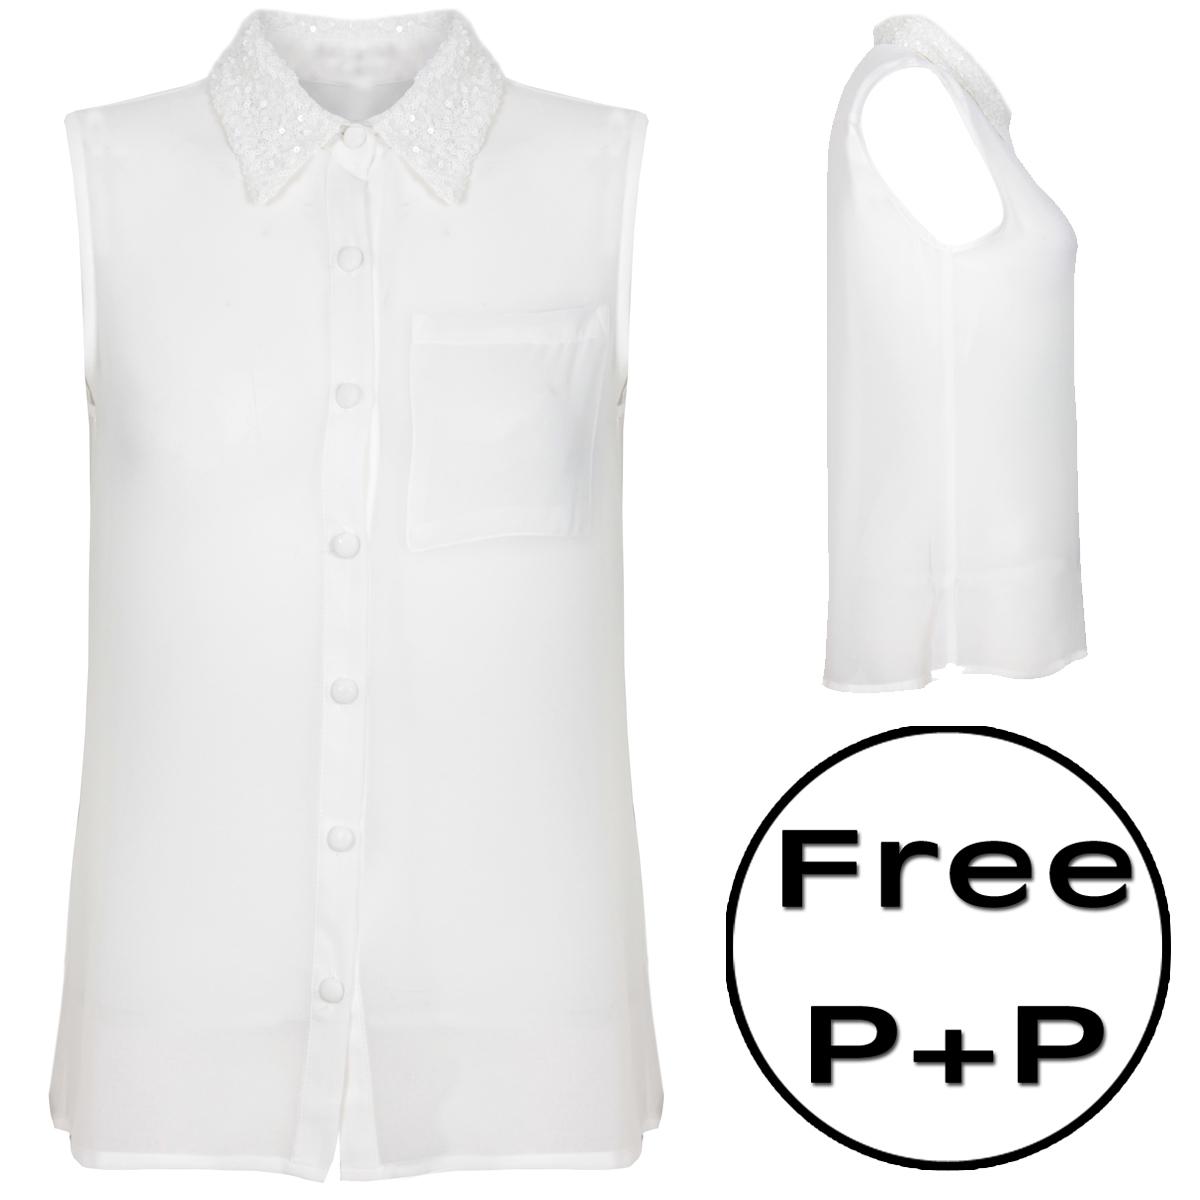 New womens white sleeveless sequin collar shirt sz 8 14 ebay for Sleeveless white shirt with collar